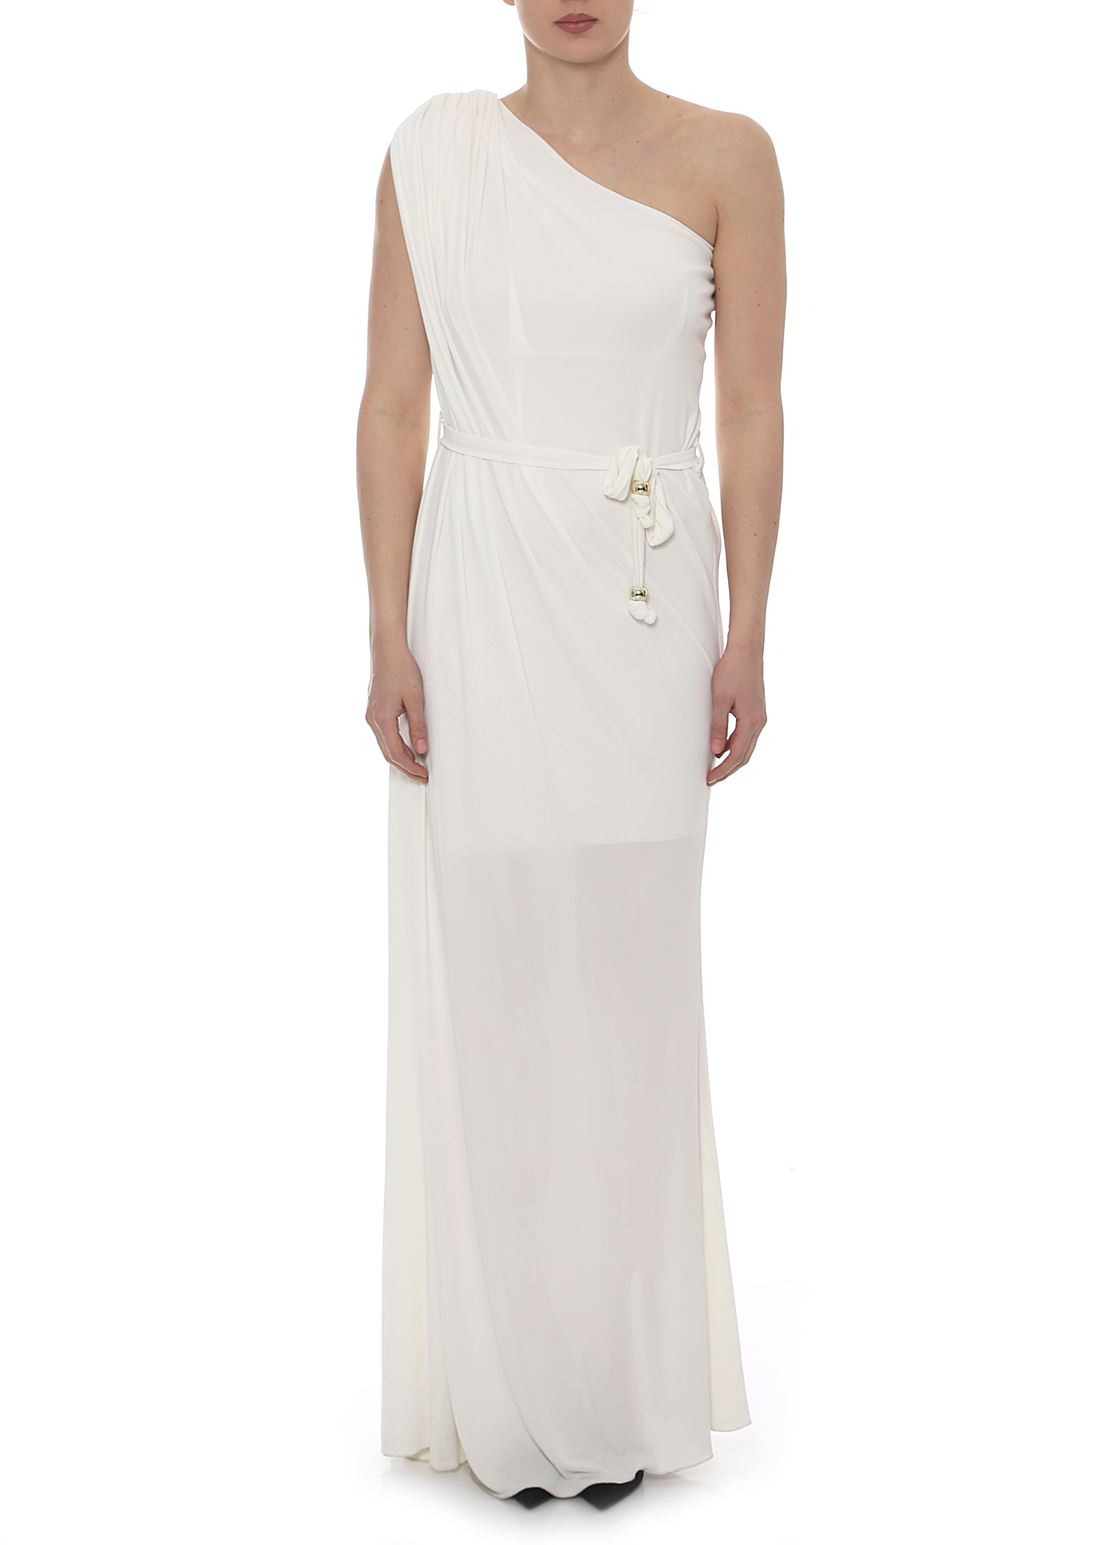 b1272a25a4ff Μακρύ Λευκό Φόρεμα LYNNE